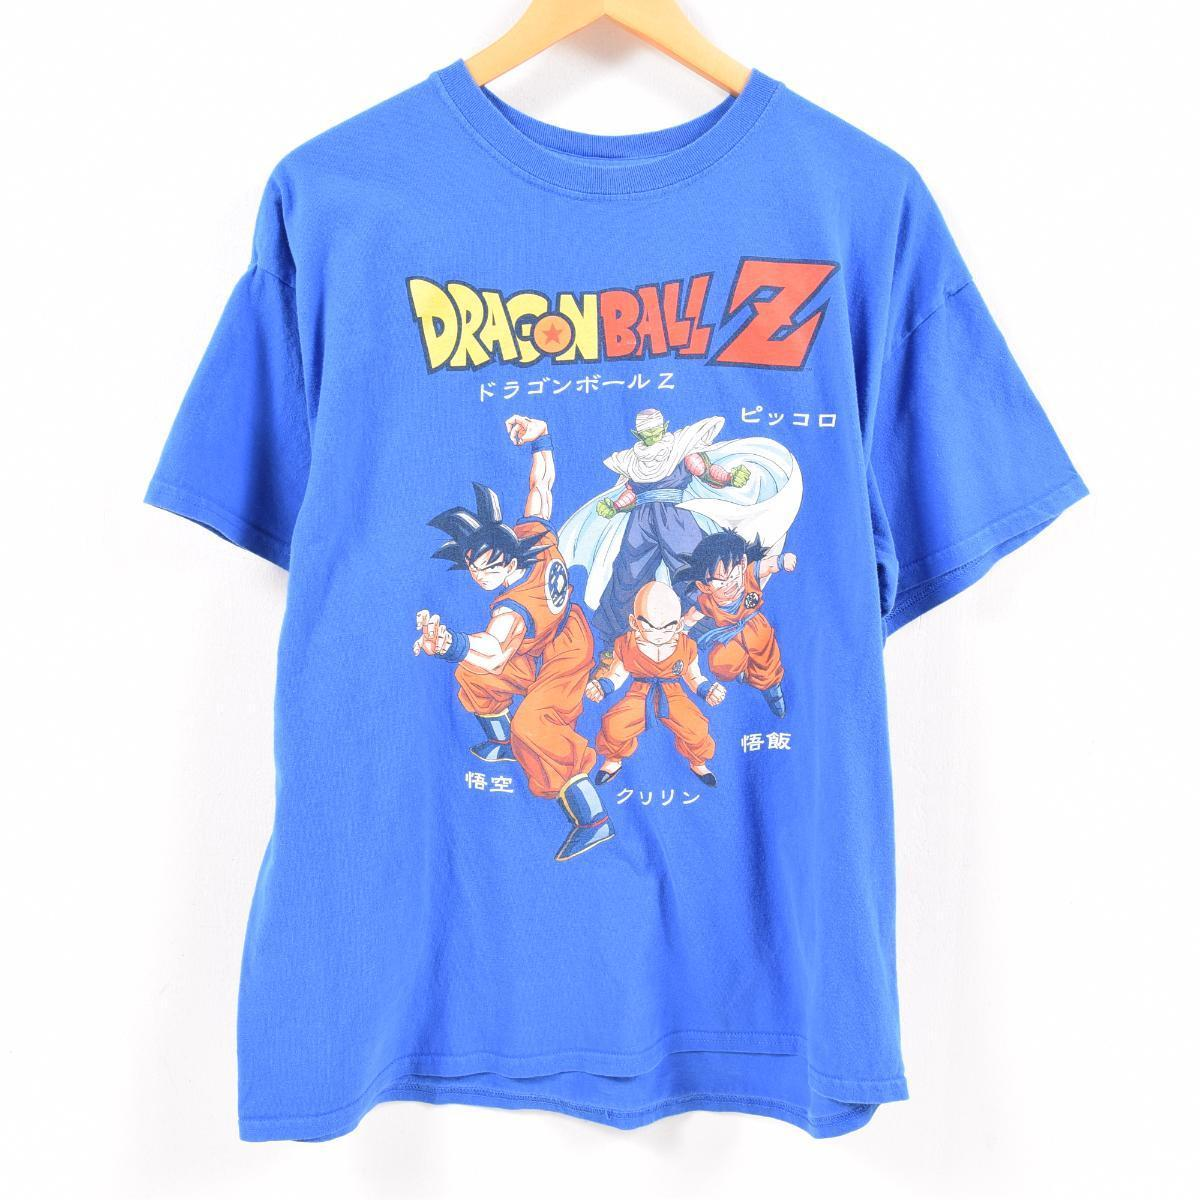 0e145031d Dragon Ball Z DRAGONBALL Z character print T-shirt Lady's XL /waw5789 ...